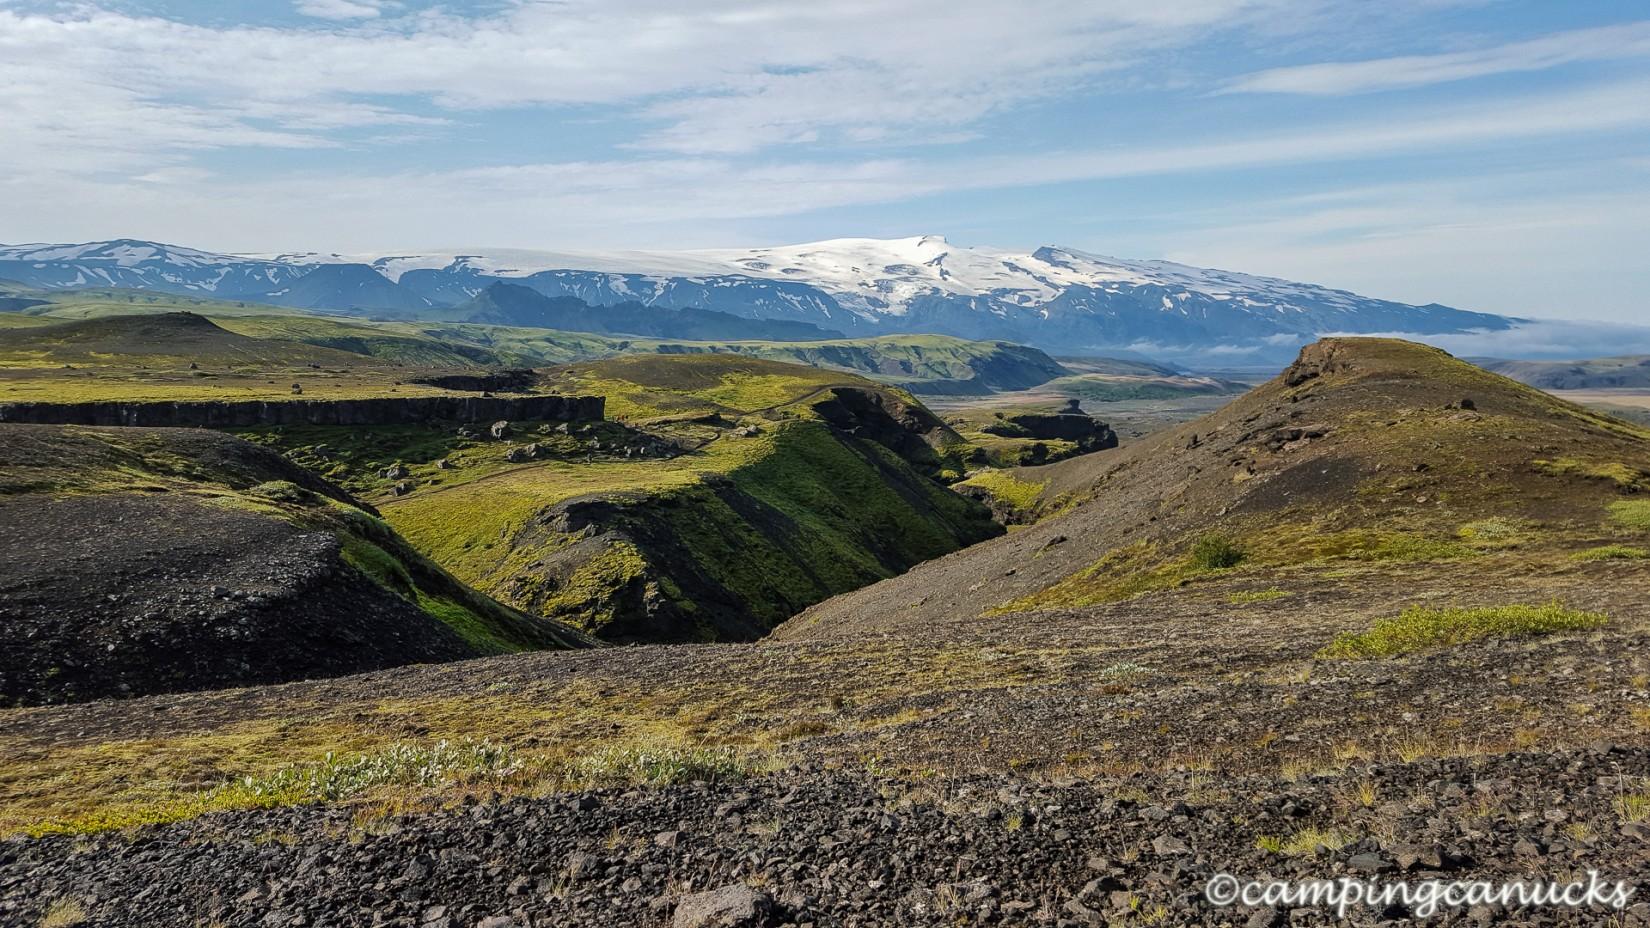 Eyjafjallajökull in the distance